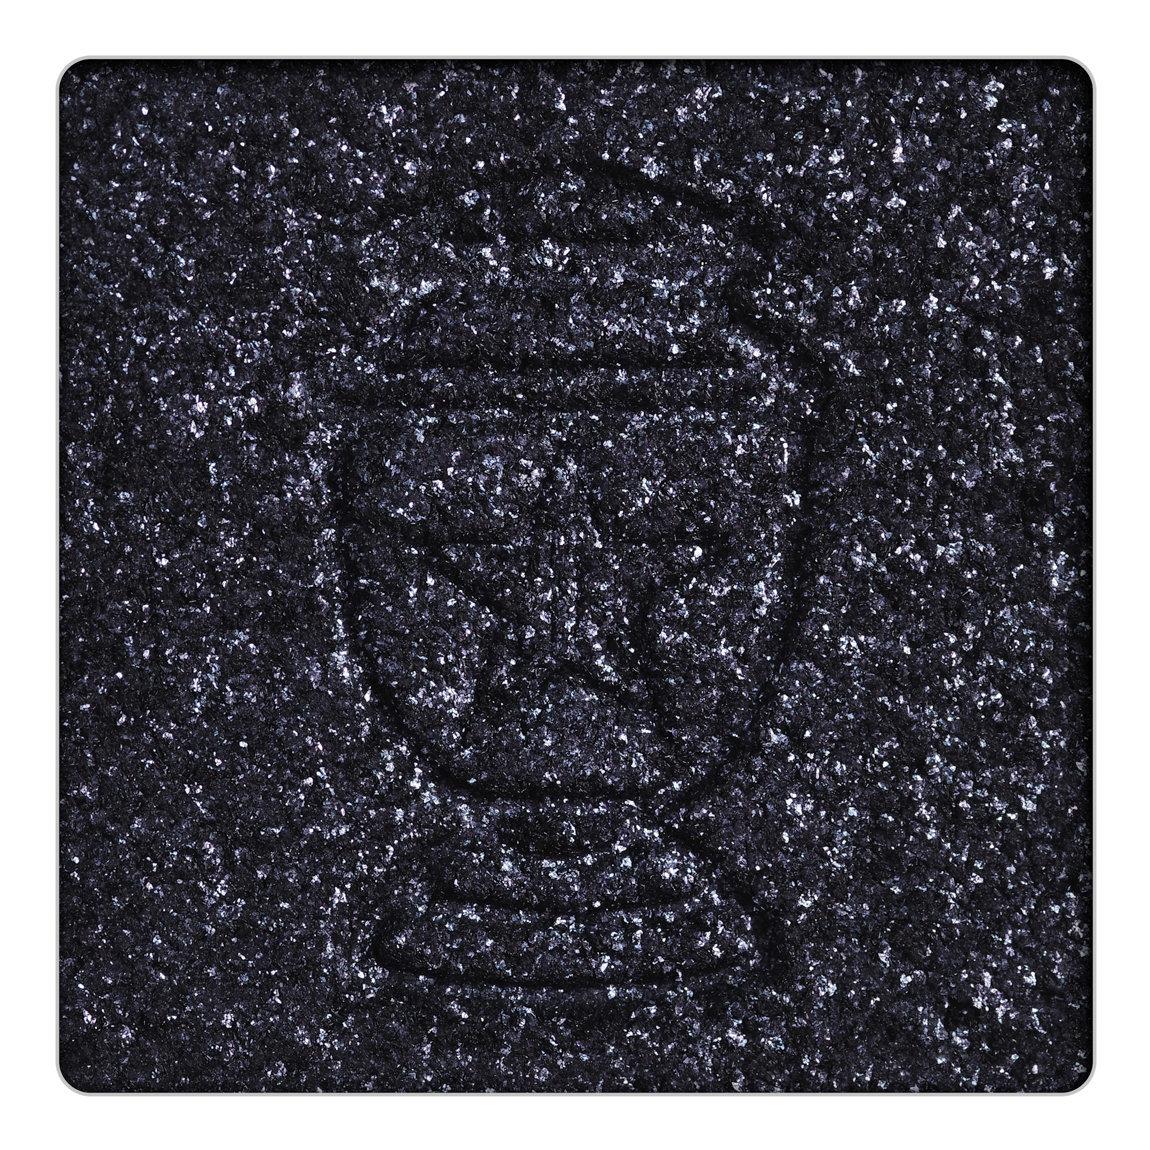 Jeffree Star Cosmetics Artistry Singles Angel of Death alternative view 1.